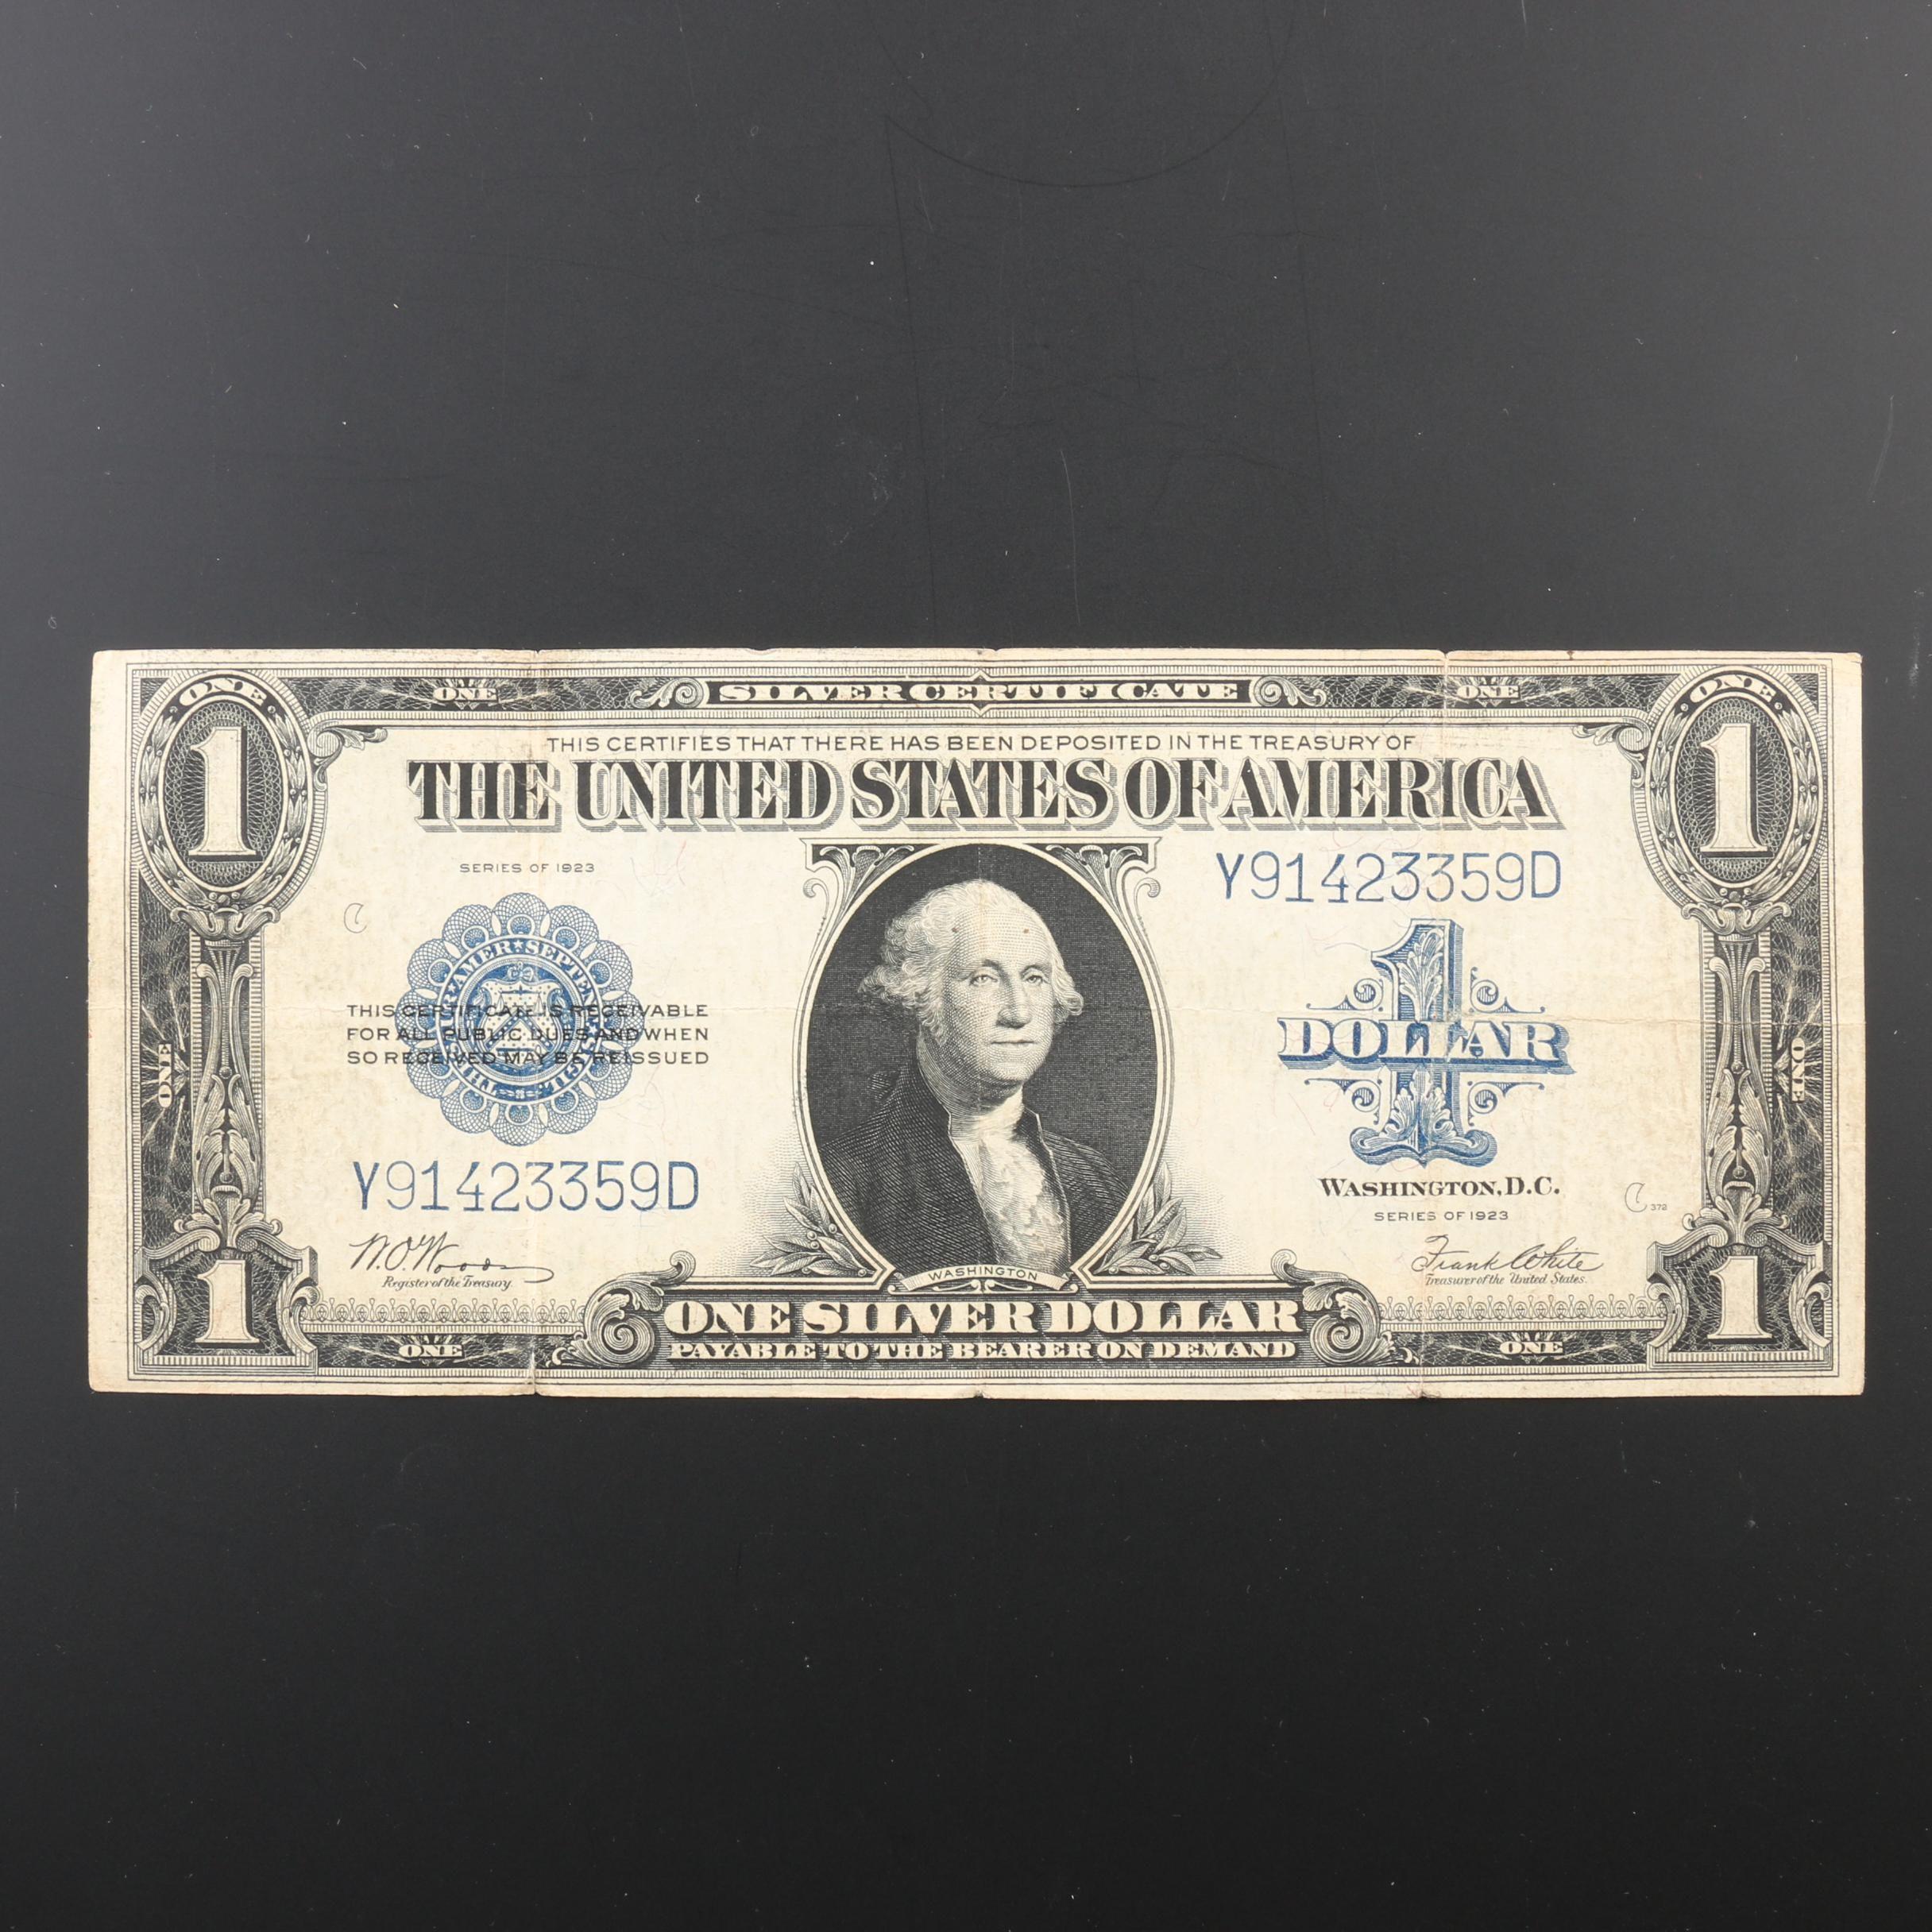 Series of 1923 U.S. $1 Silver Certificate